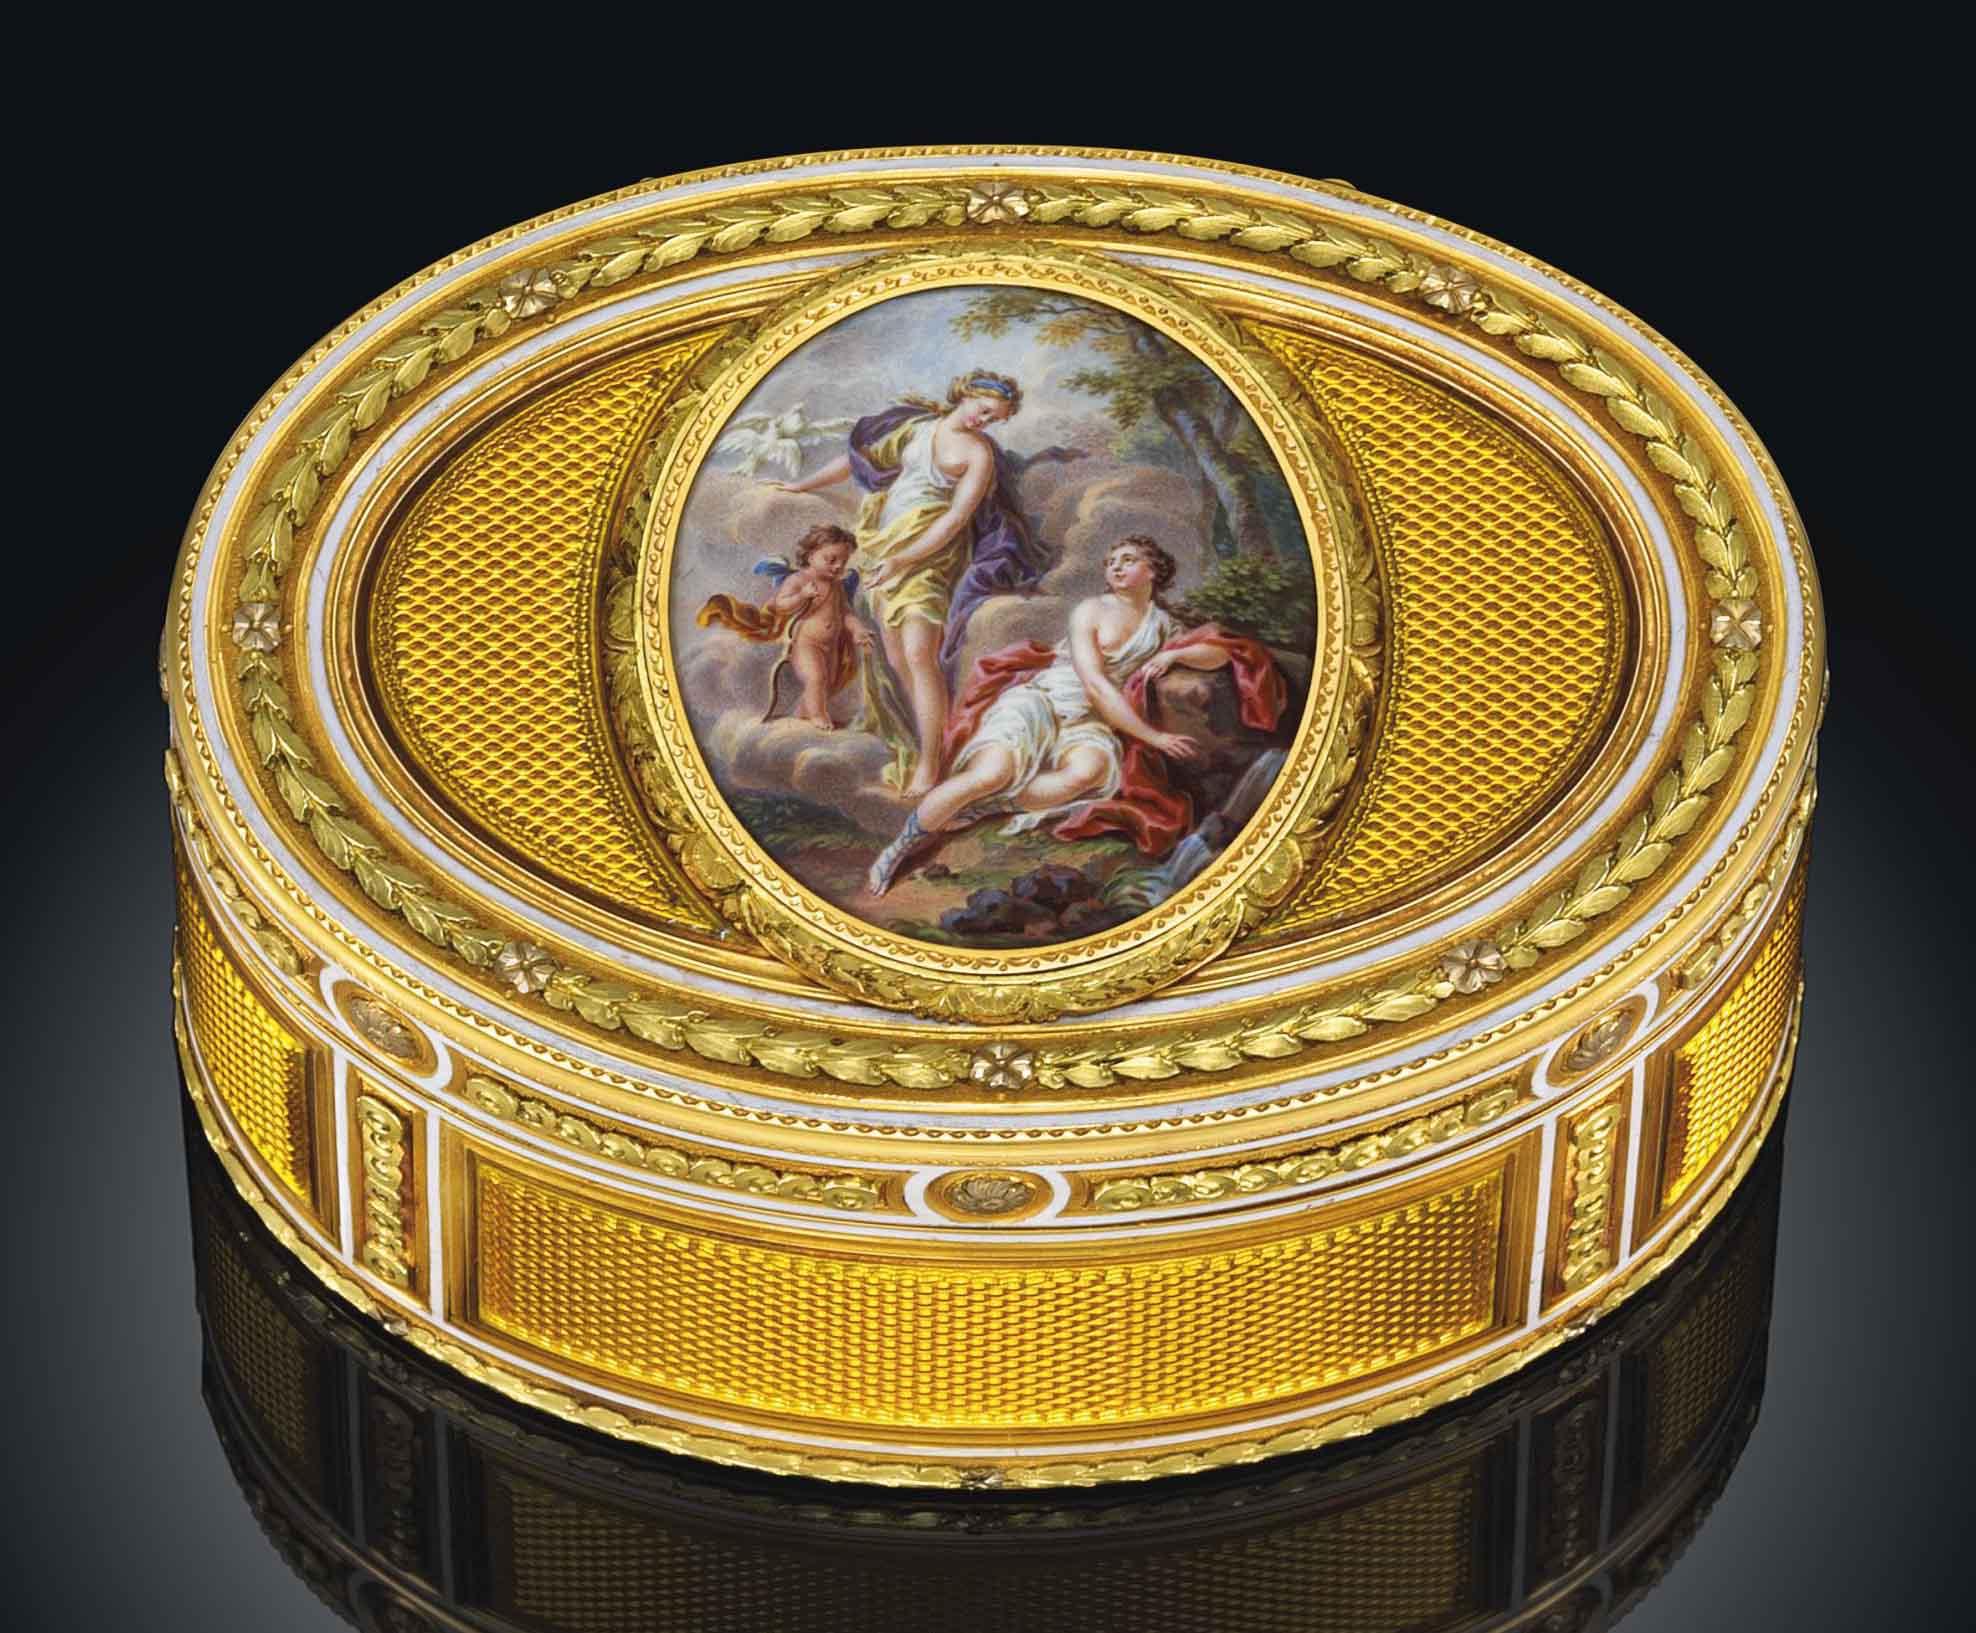 AN IMPORTANT LOUIS XVI ENAMELLED THREE-COLOUR GOLD SNUFF-BOX SET WITH AN ENAMEL PLAQUE